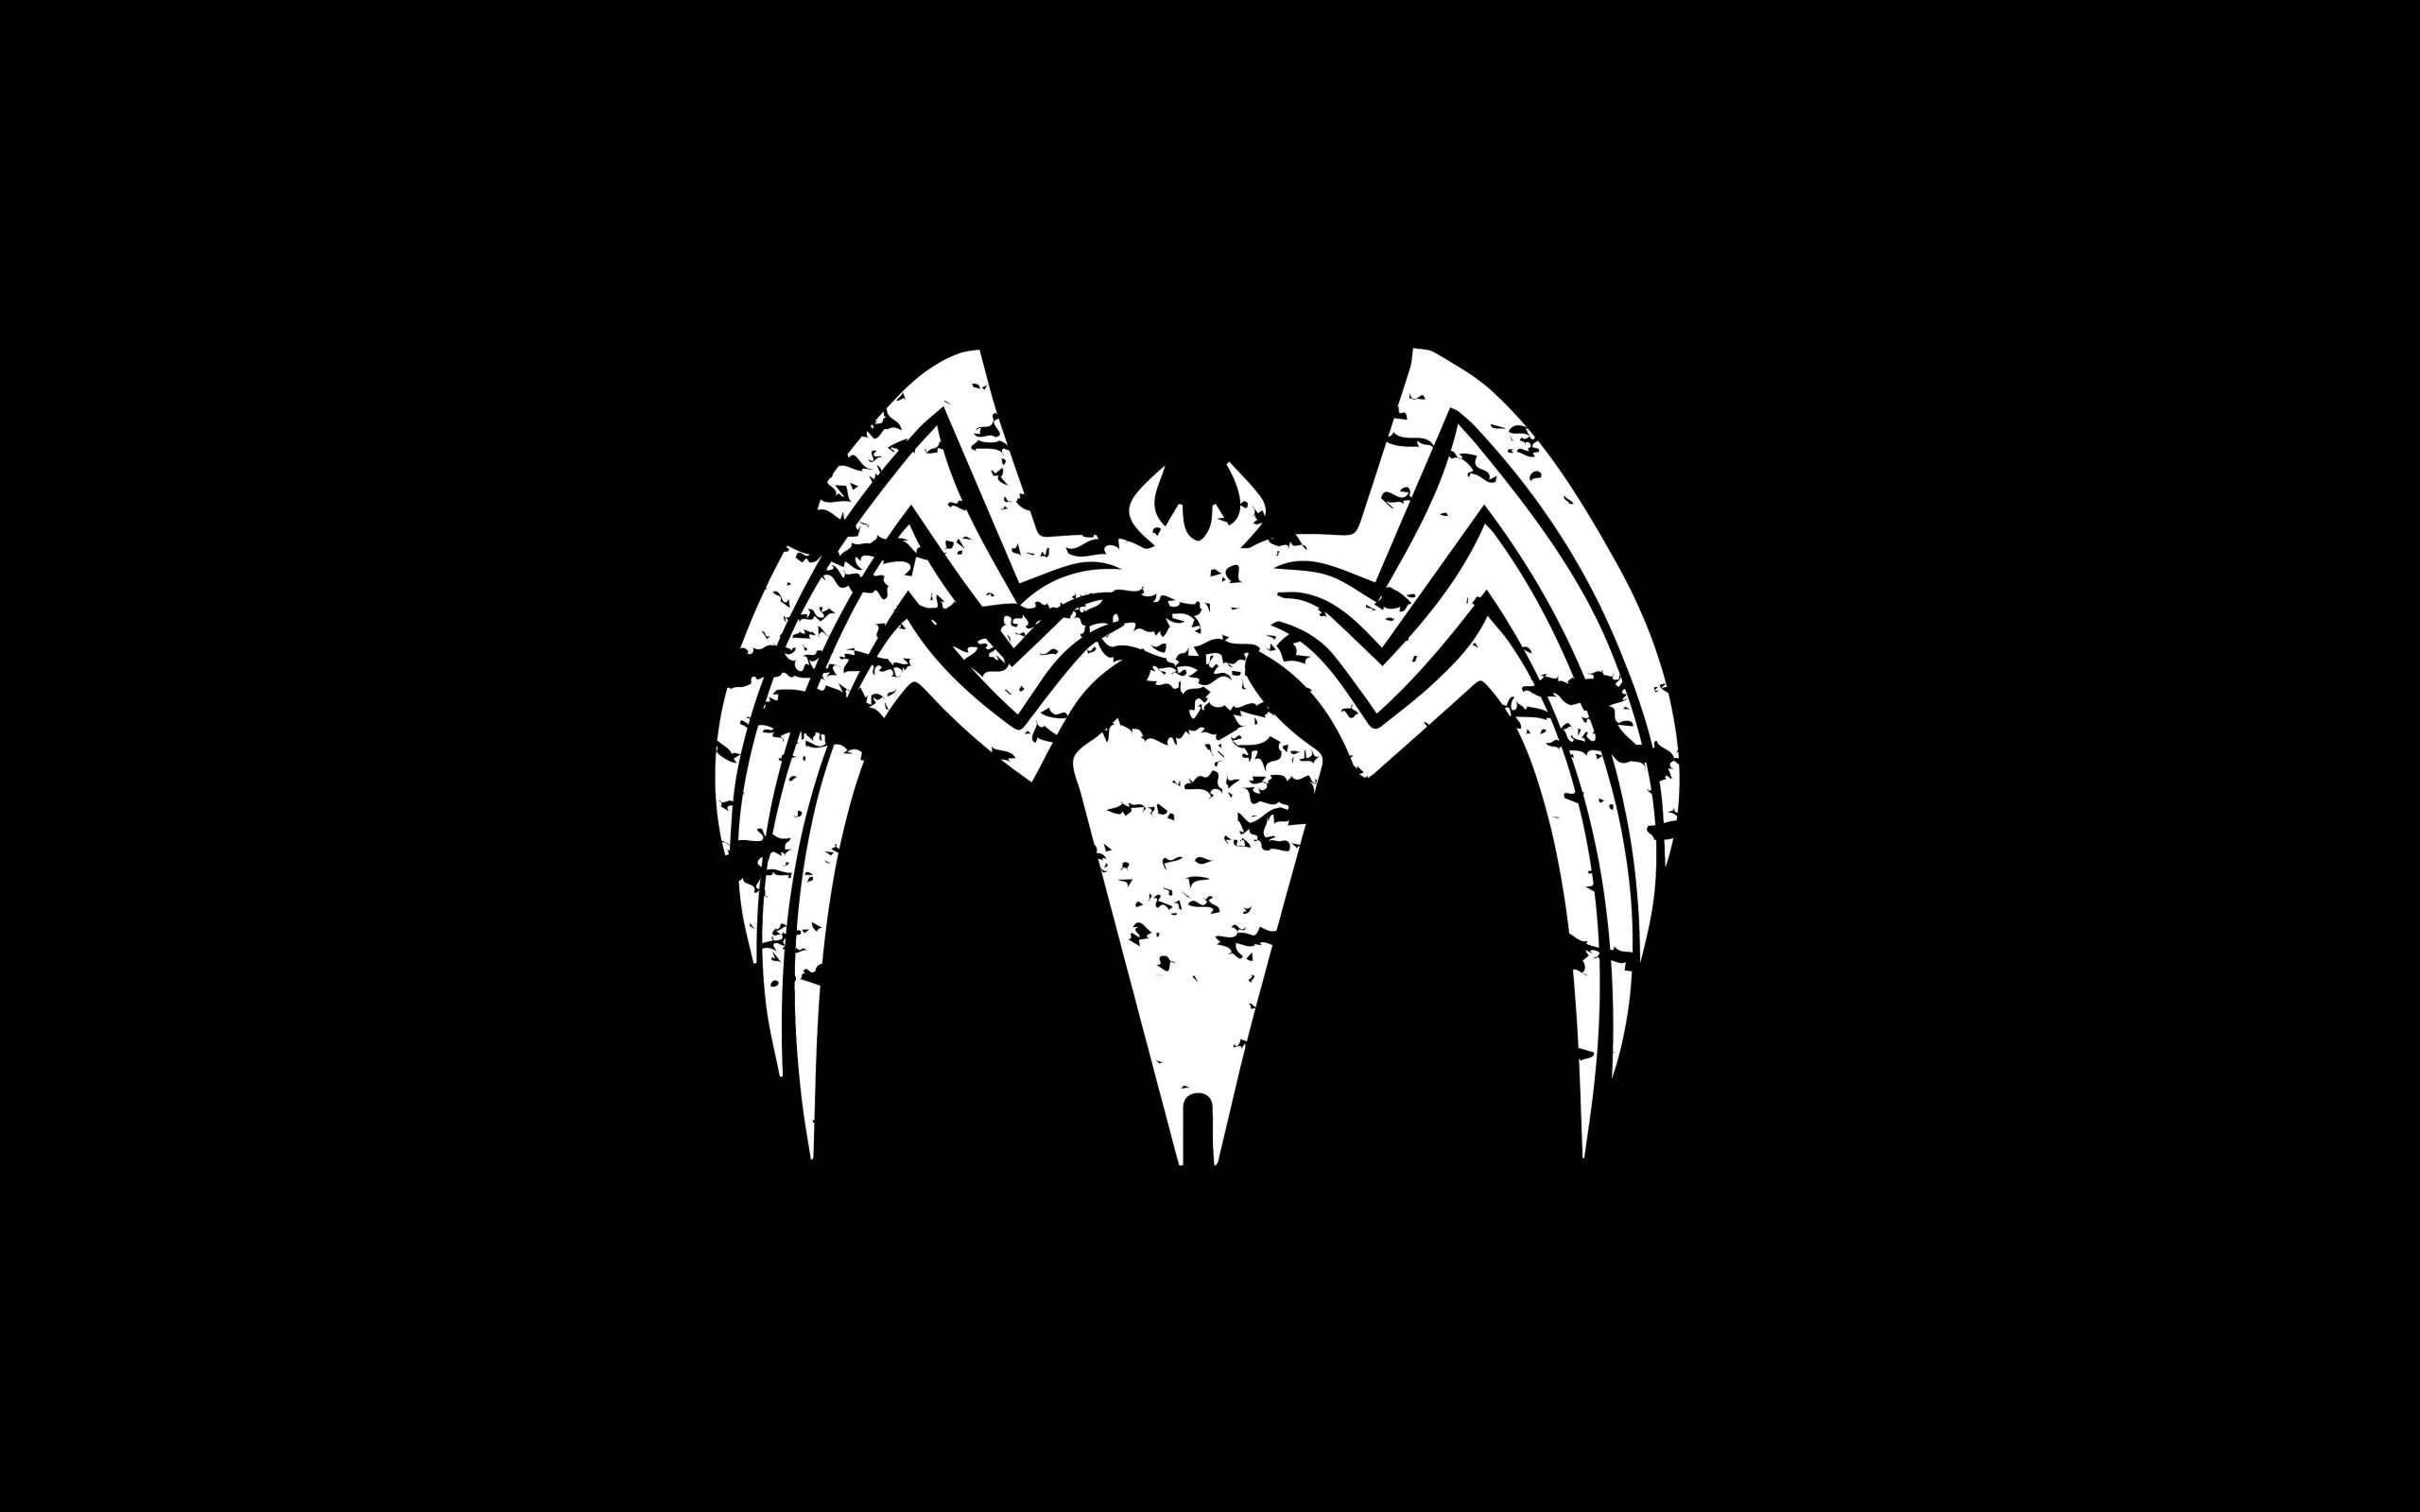 Must see Wallpaper Movie Black - venom-movie-spider-black-poster-5k-wallpaper-2560x1600  Pictures_73813.jpg